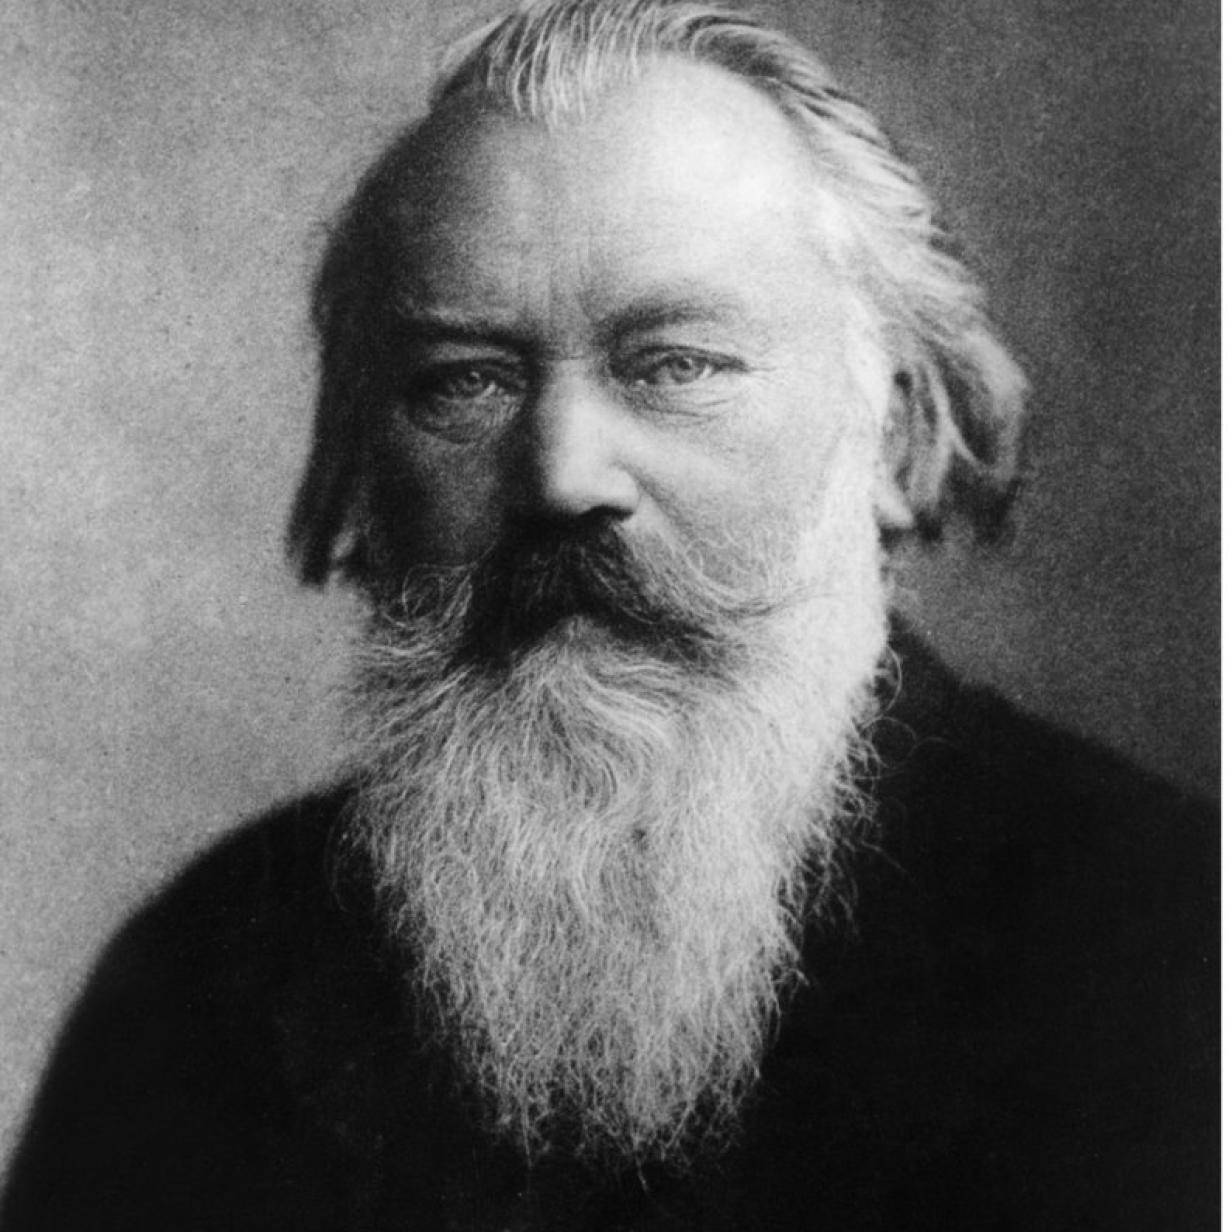 Alles aus Neugier: Brahms lag im Papierkorb